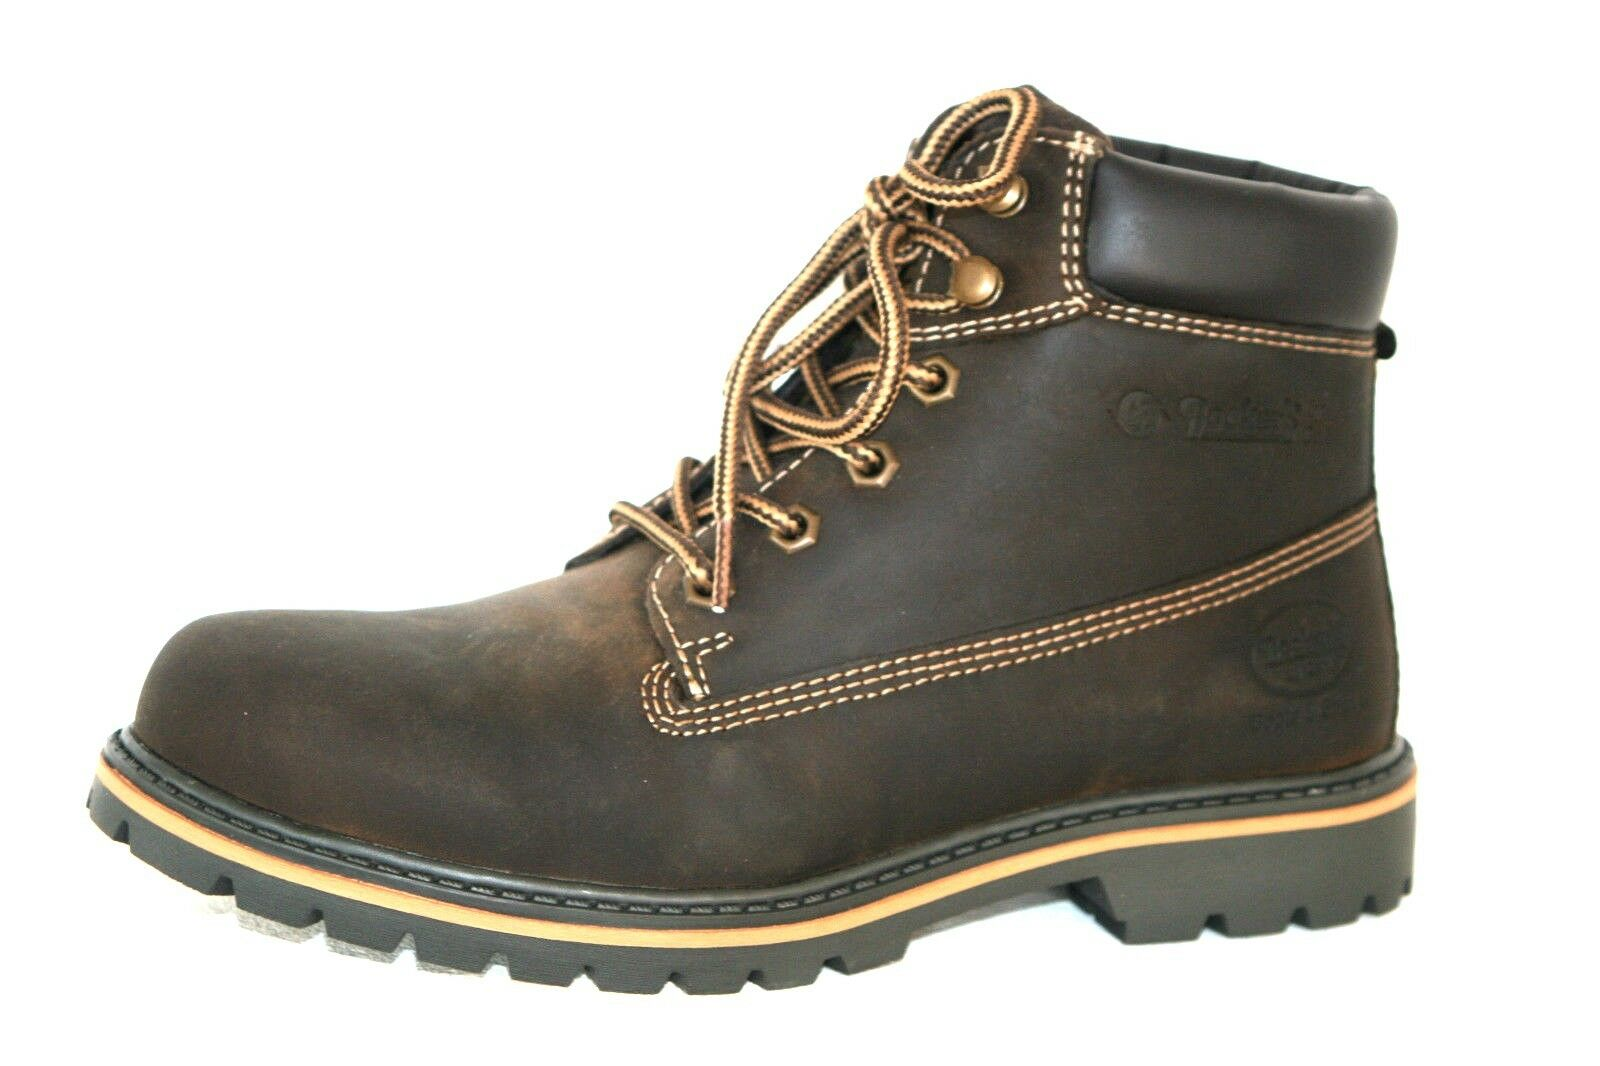 Dockers Boots Wanderschuhe Stiefel Bergsteigerstiefel braun Leder Herren